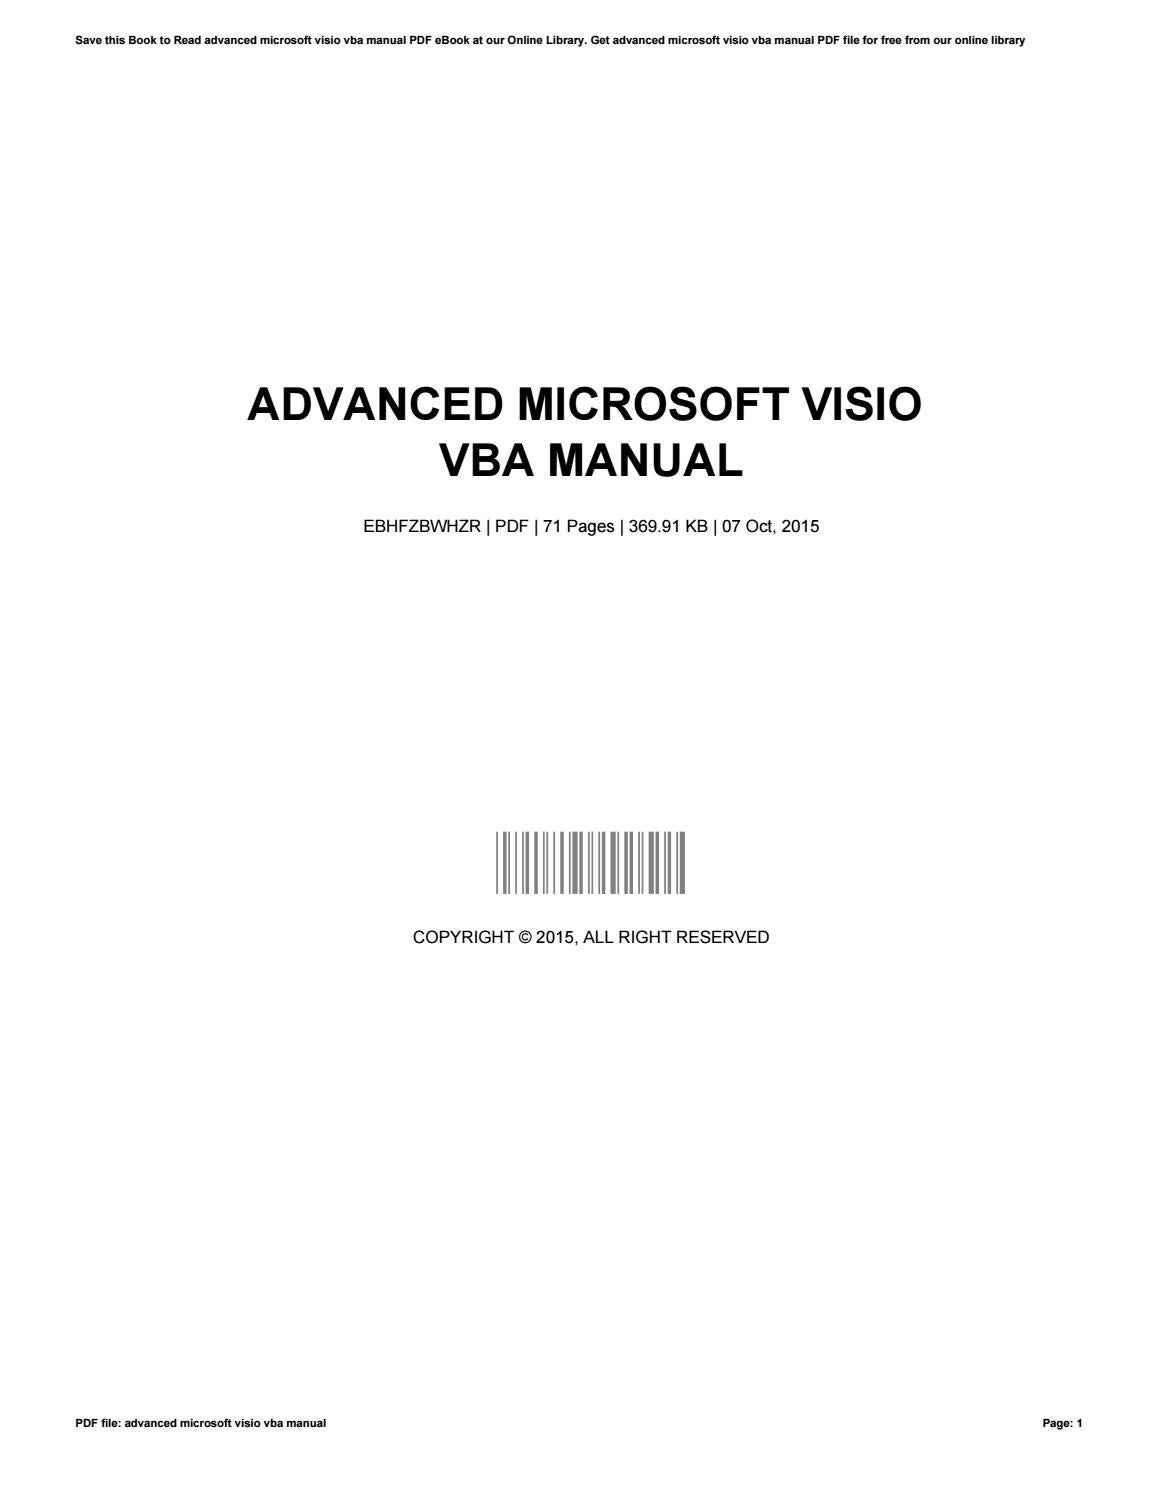 advanced microsoft visio vba manual by patriciamiller2583 issuu - Microsoft Visio Manual